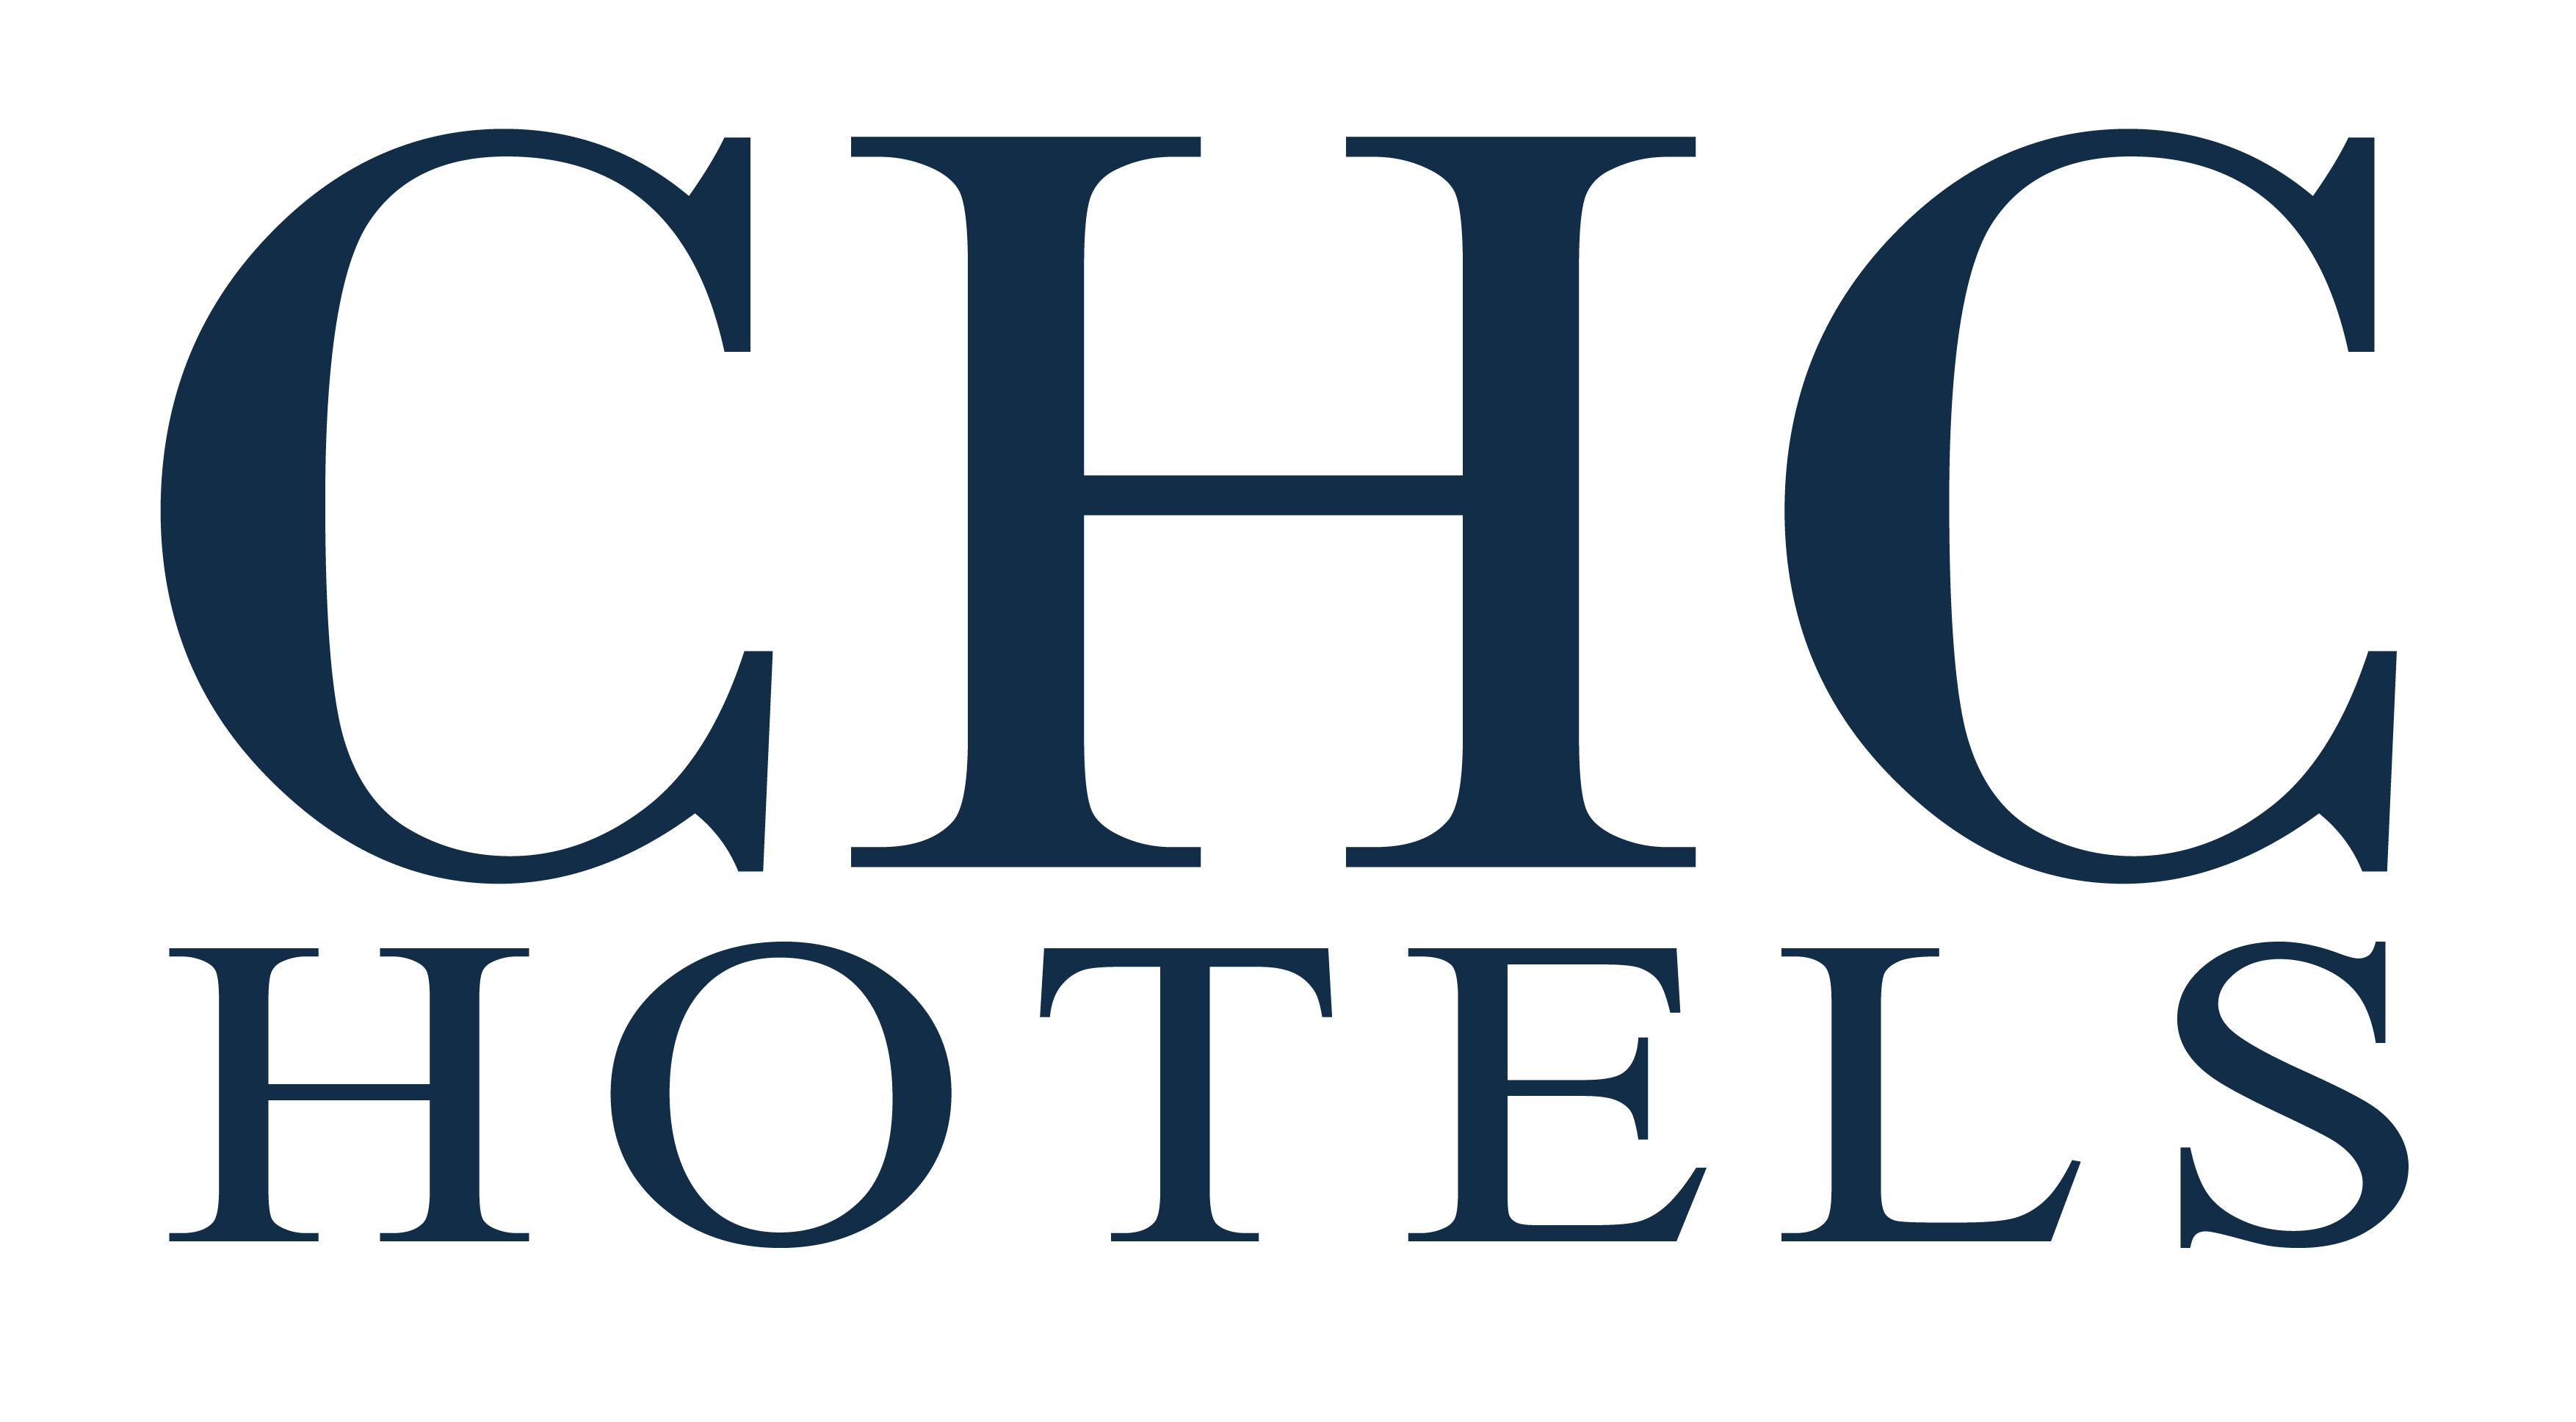 CHC_HOTELS